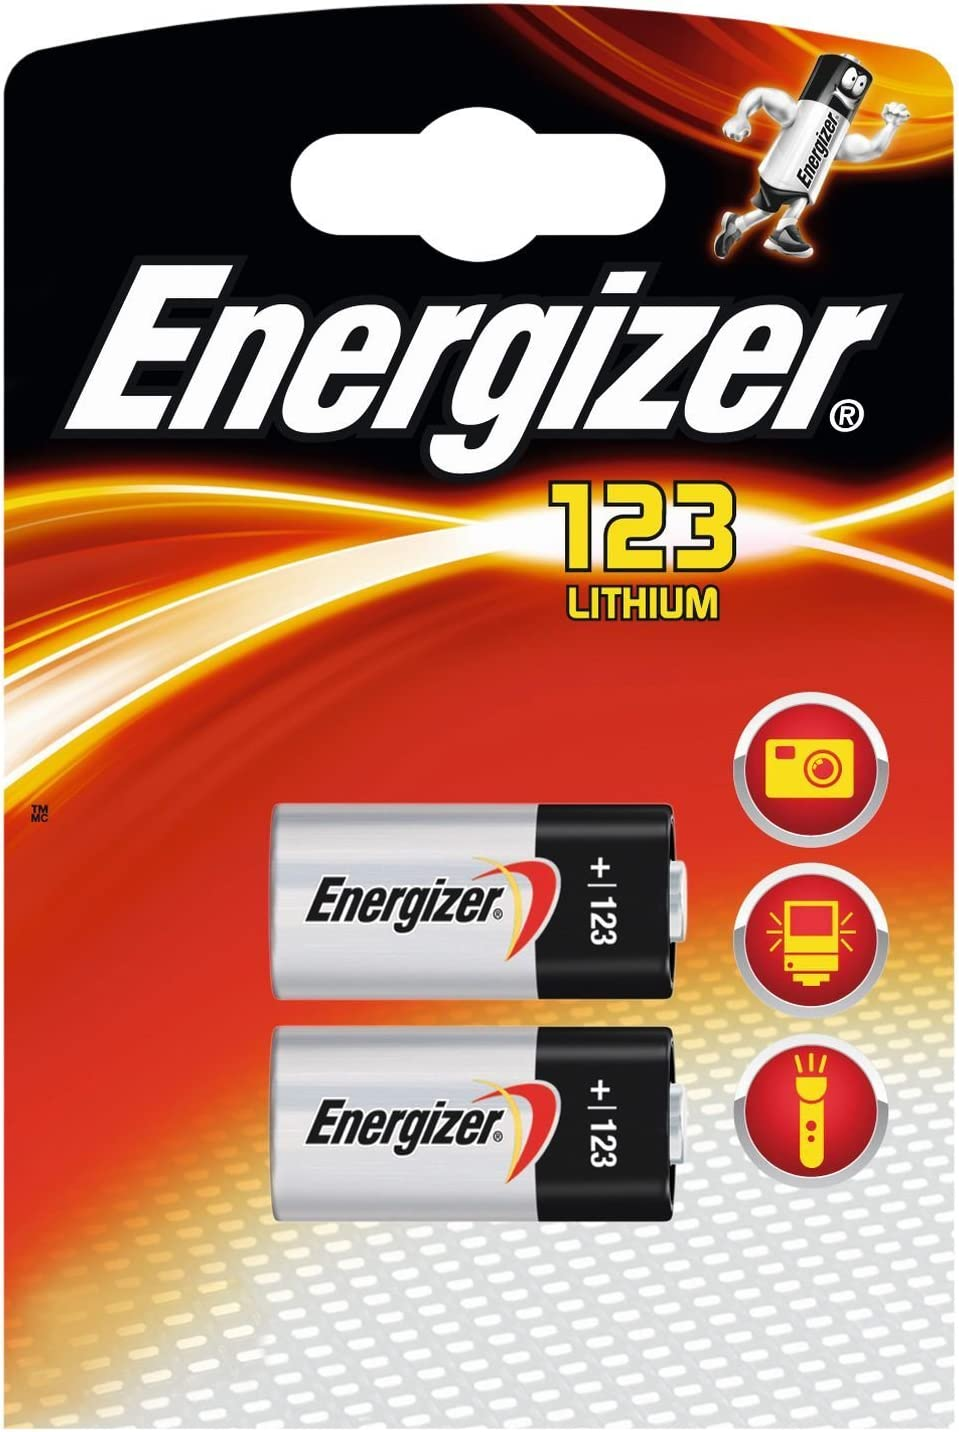 Energizer Lithium Batterien Cr123 3 V 12 Stück Elektronik